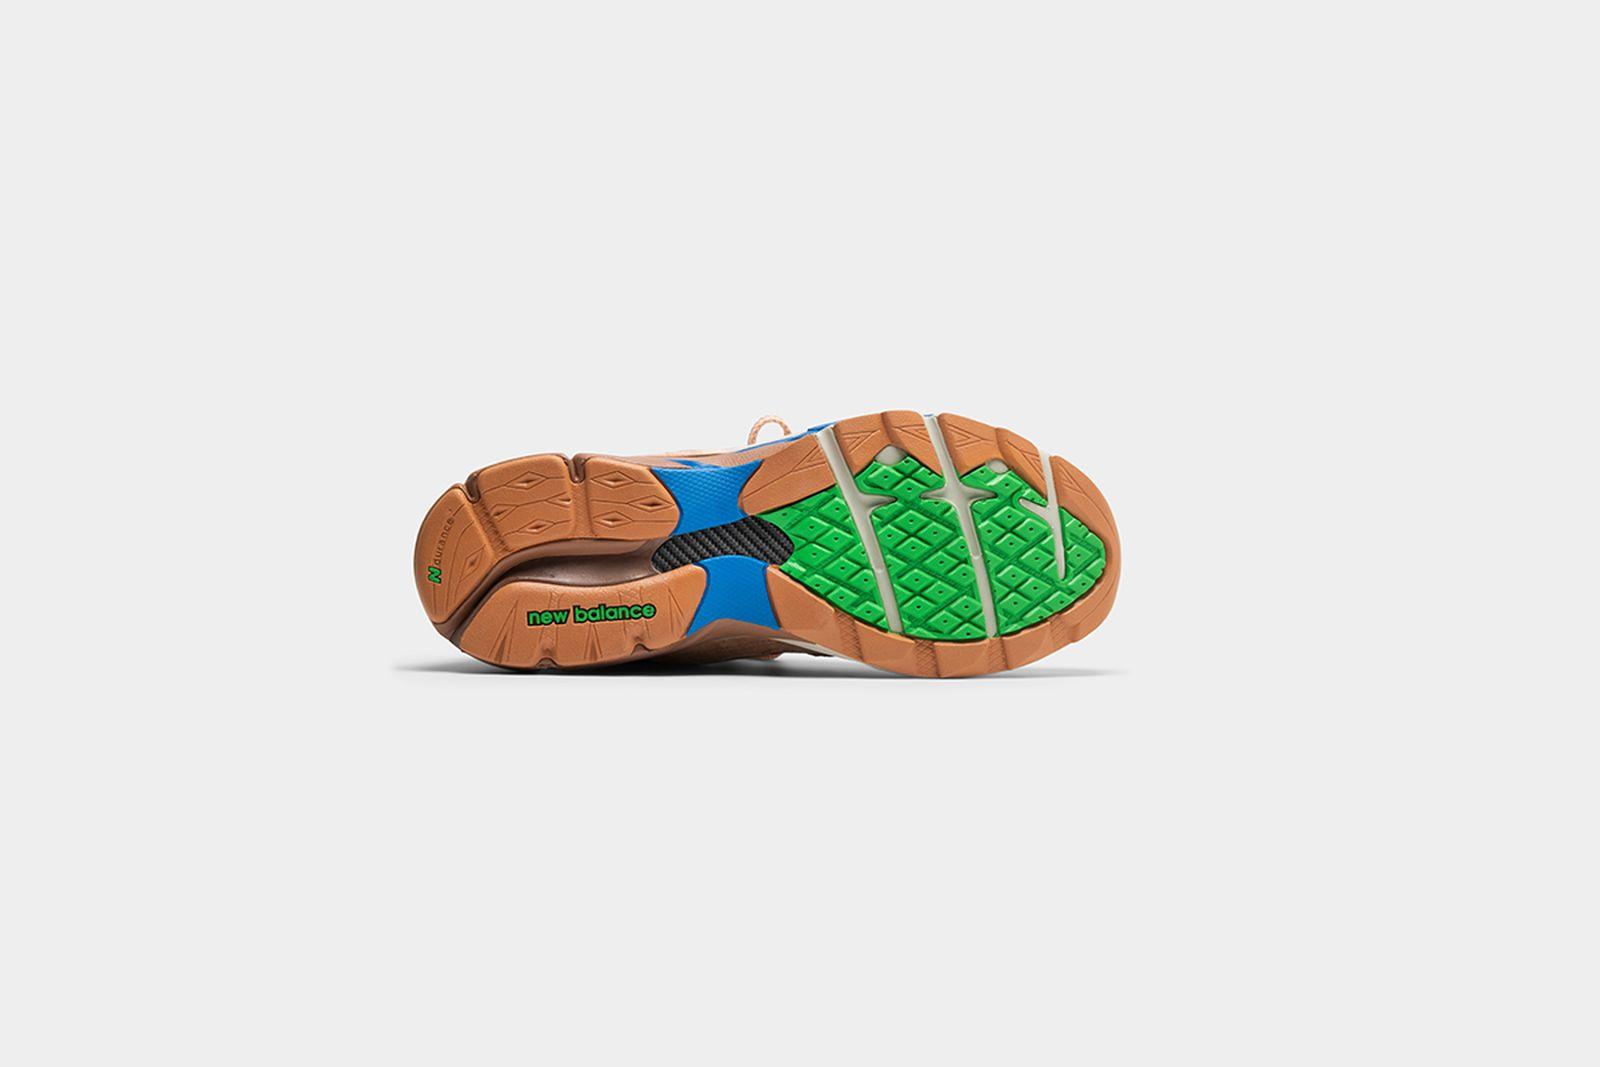 joe-freshgoods-new-balance-990v3-release-date-price-07